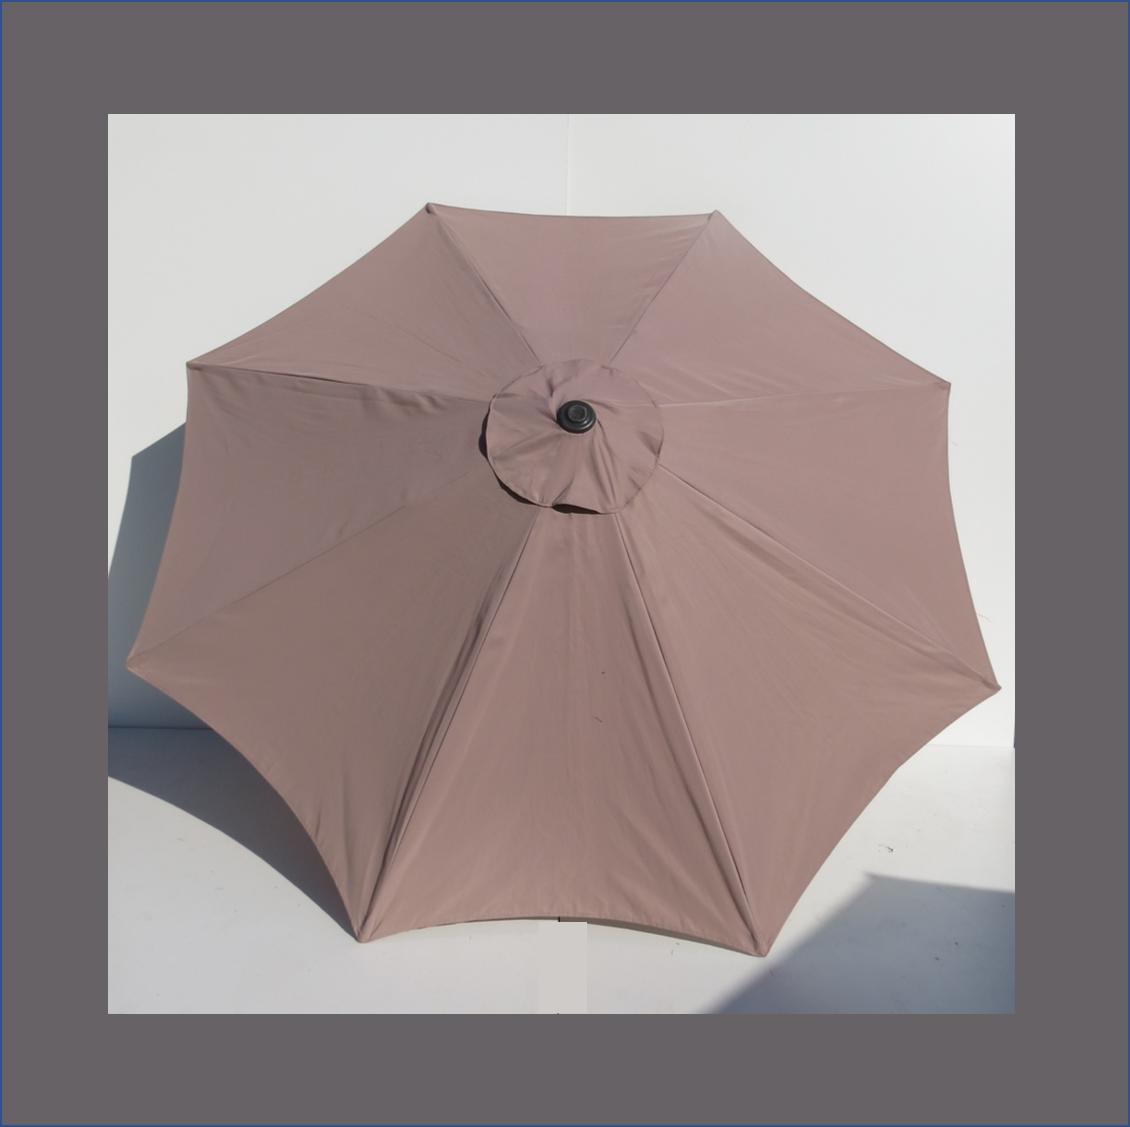 khaki-parasol-umbrellas